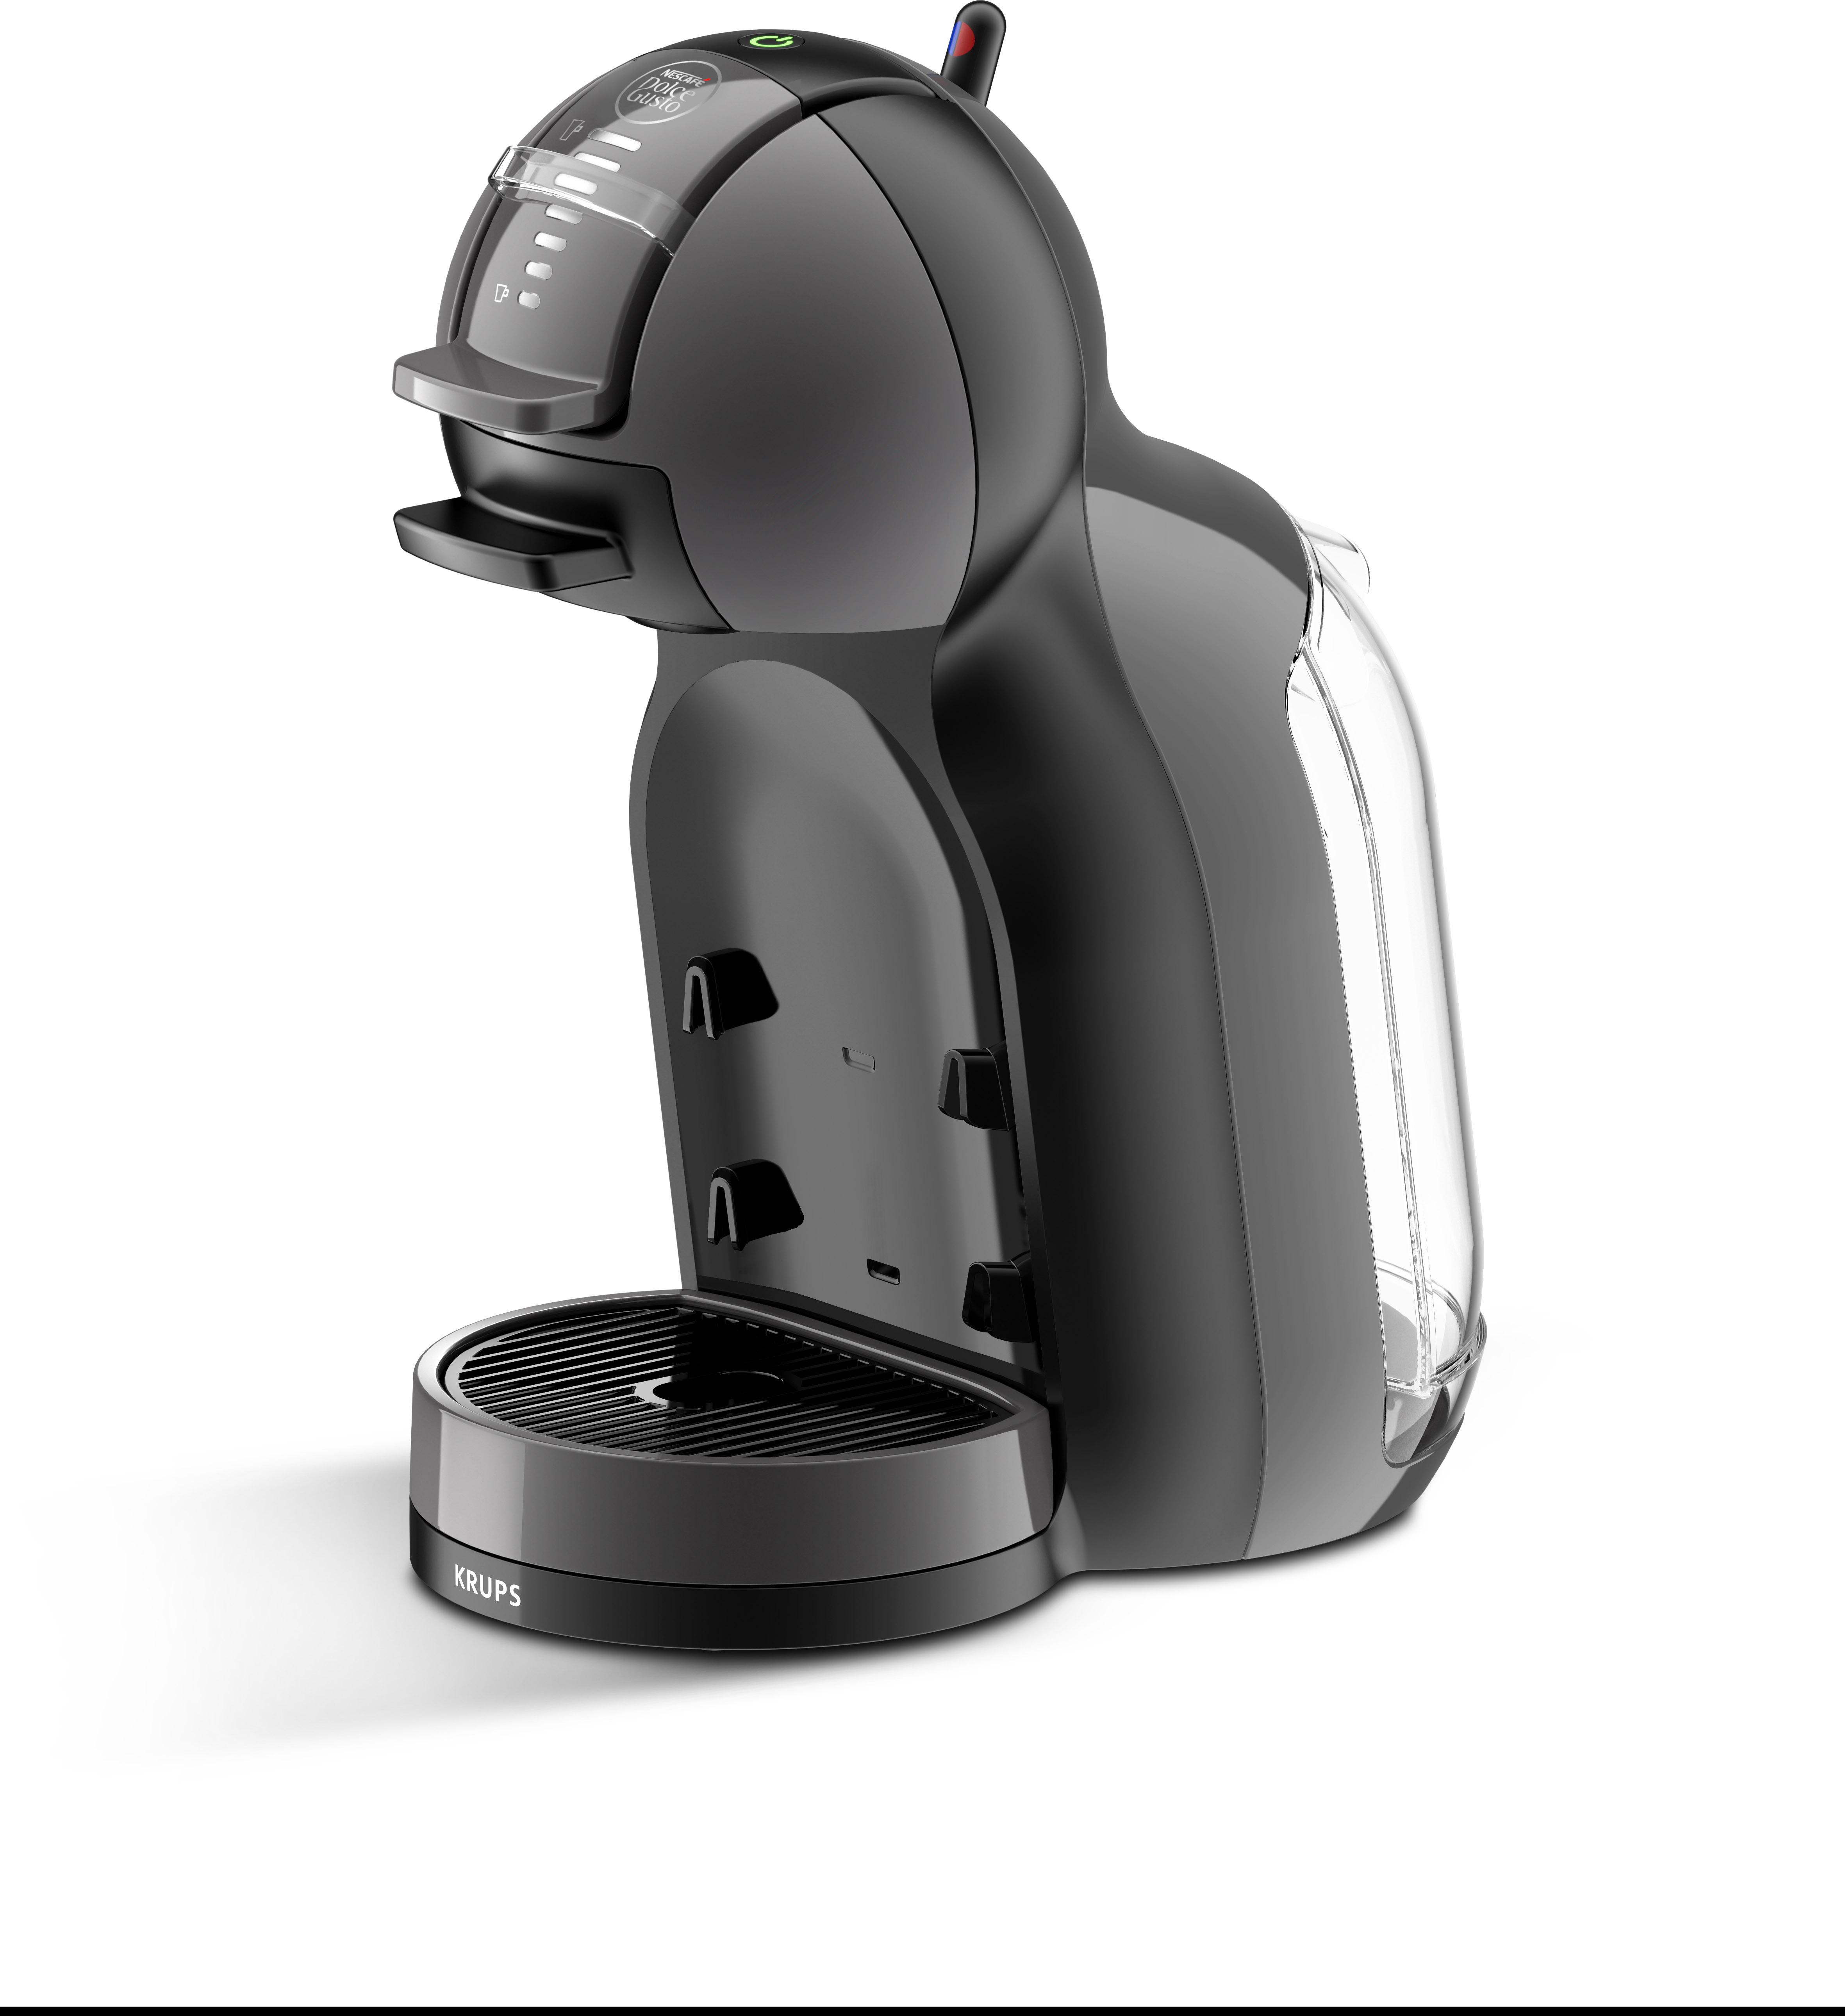 Кофемашина NESCAFE Dolce Gusto Krups KP120810 Mini Me черная Krups KP120810 Mini Me -уникальная система...